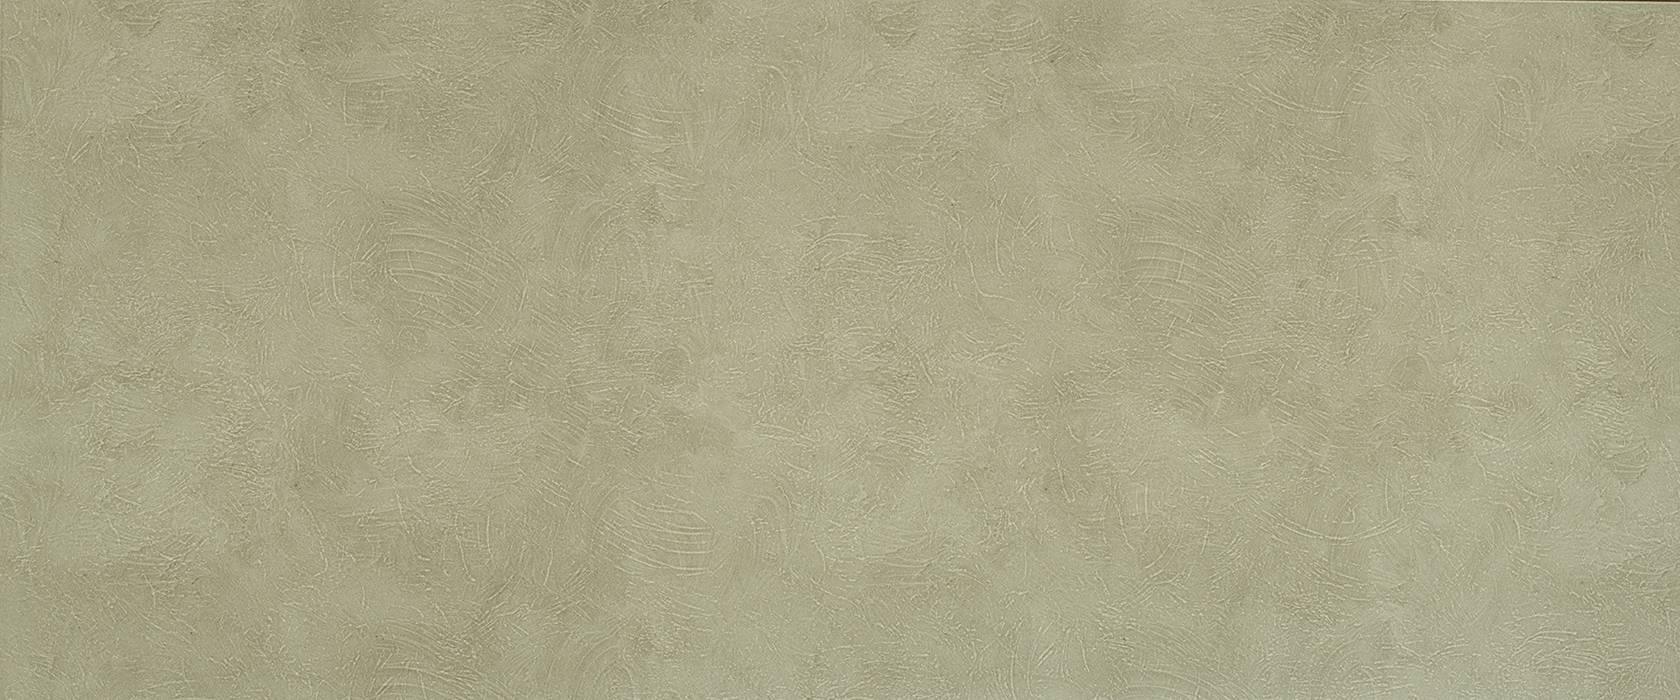 Плитка настенная Gracia Ceramica Concrete 01 grey 250х600